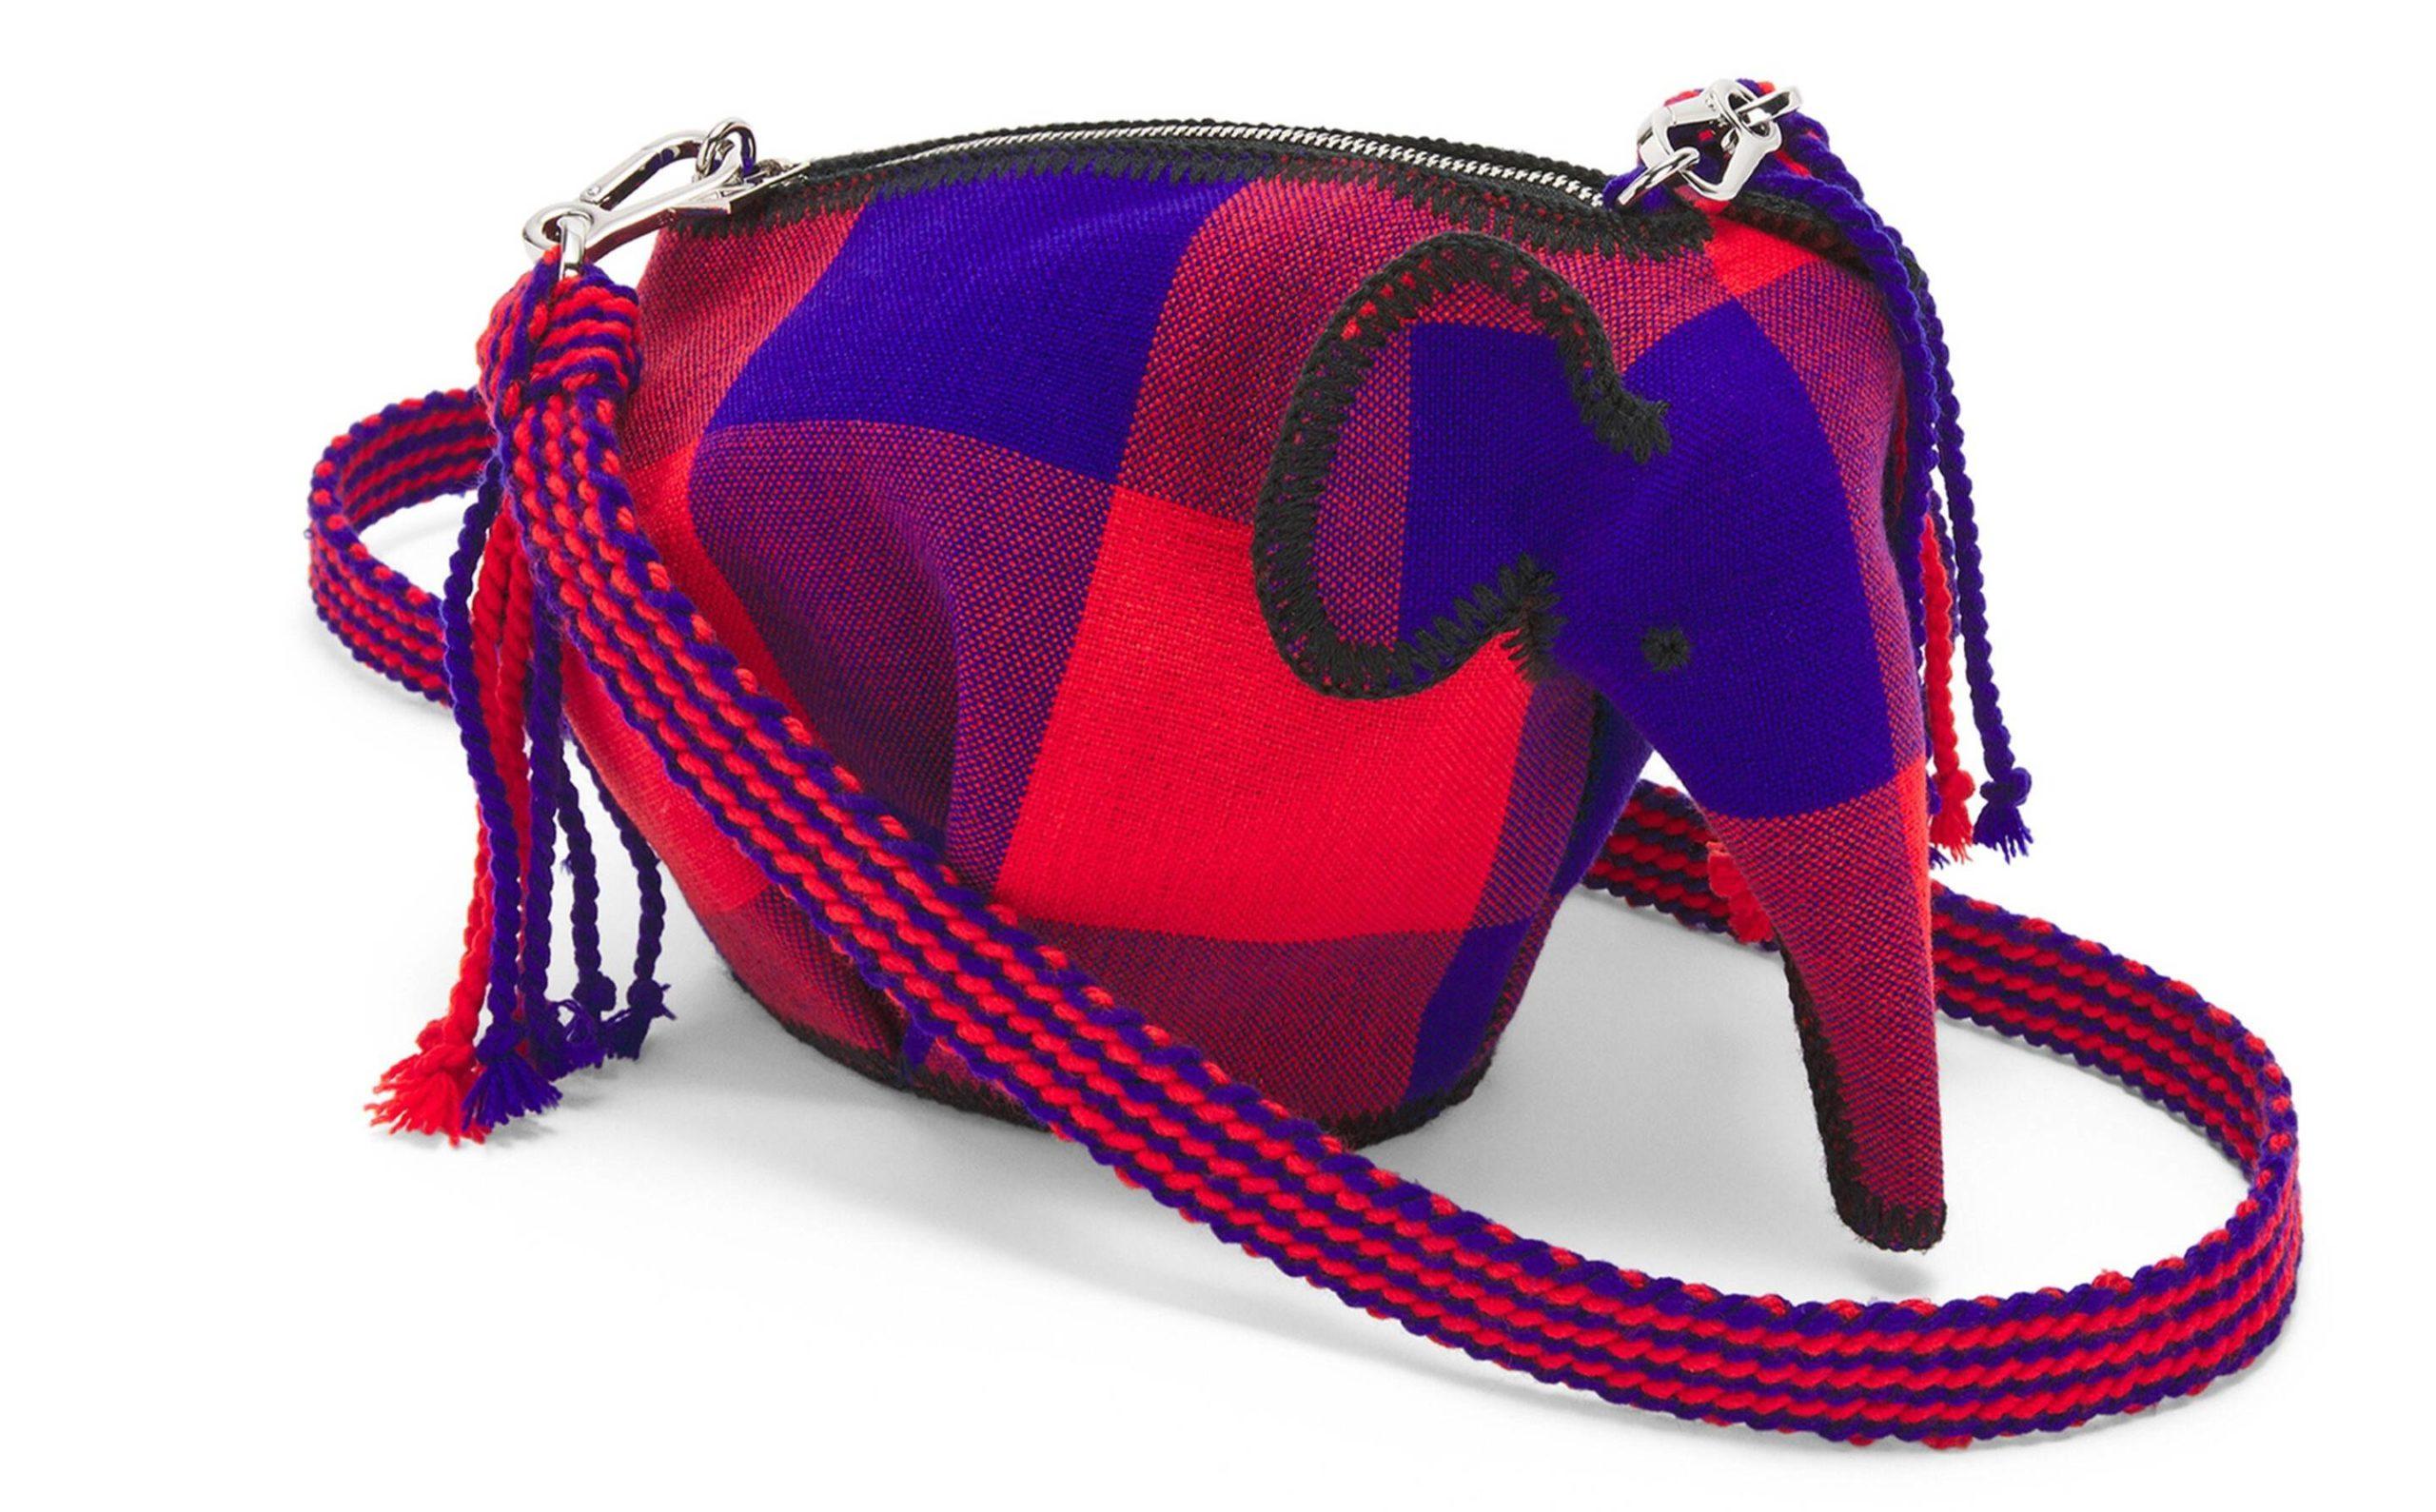 Loewe's Elephant mini bag helpt goede doel Knot On My Planet